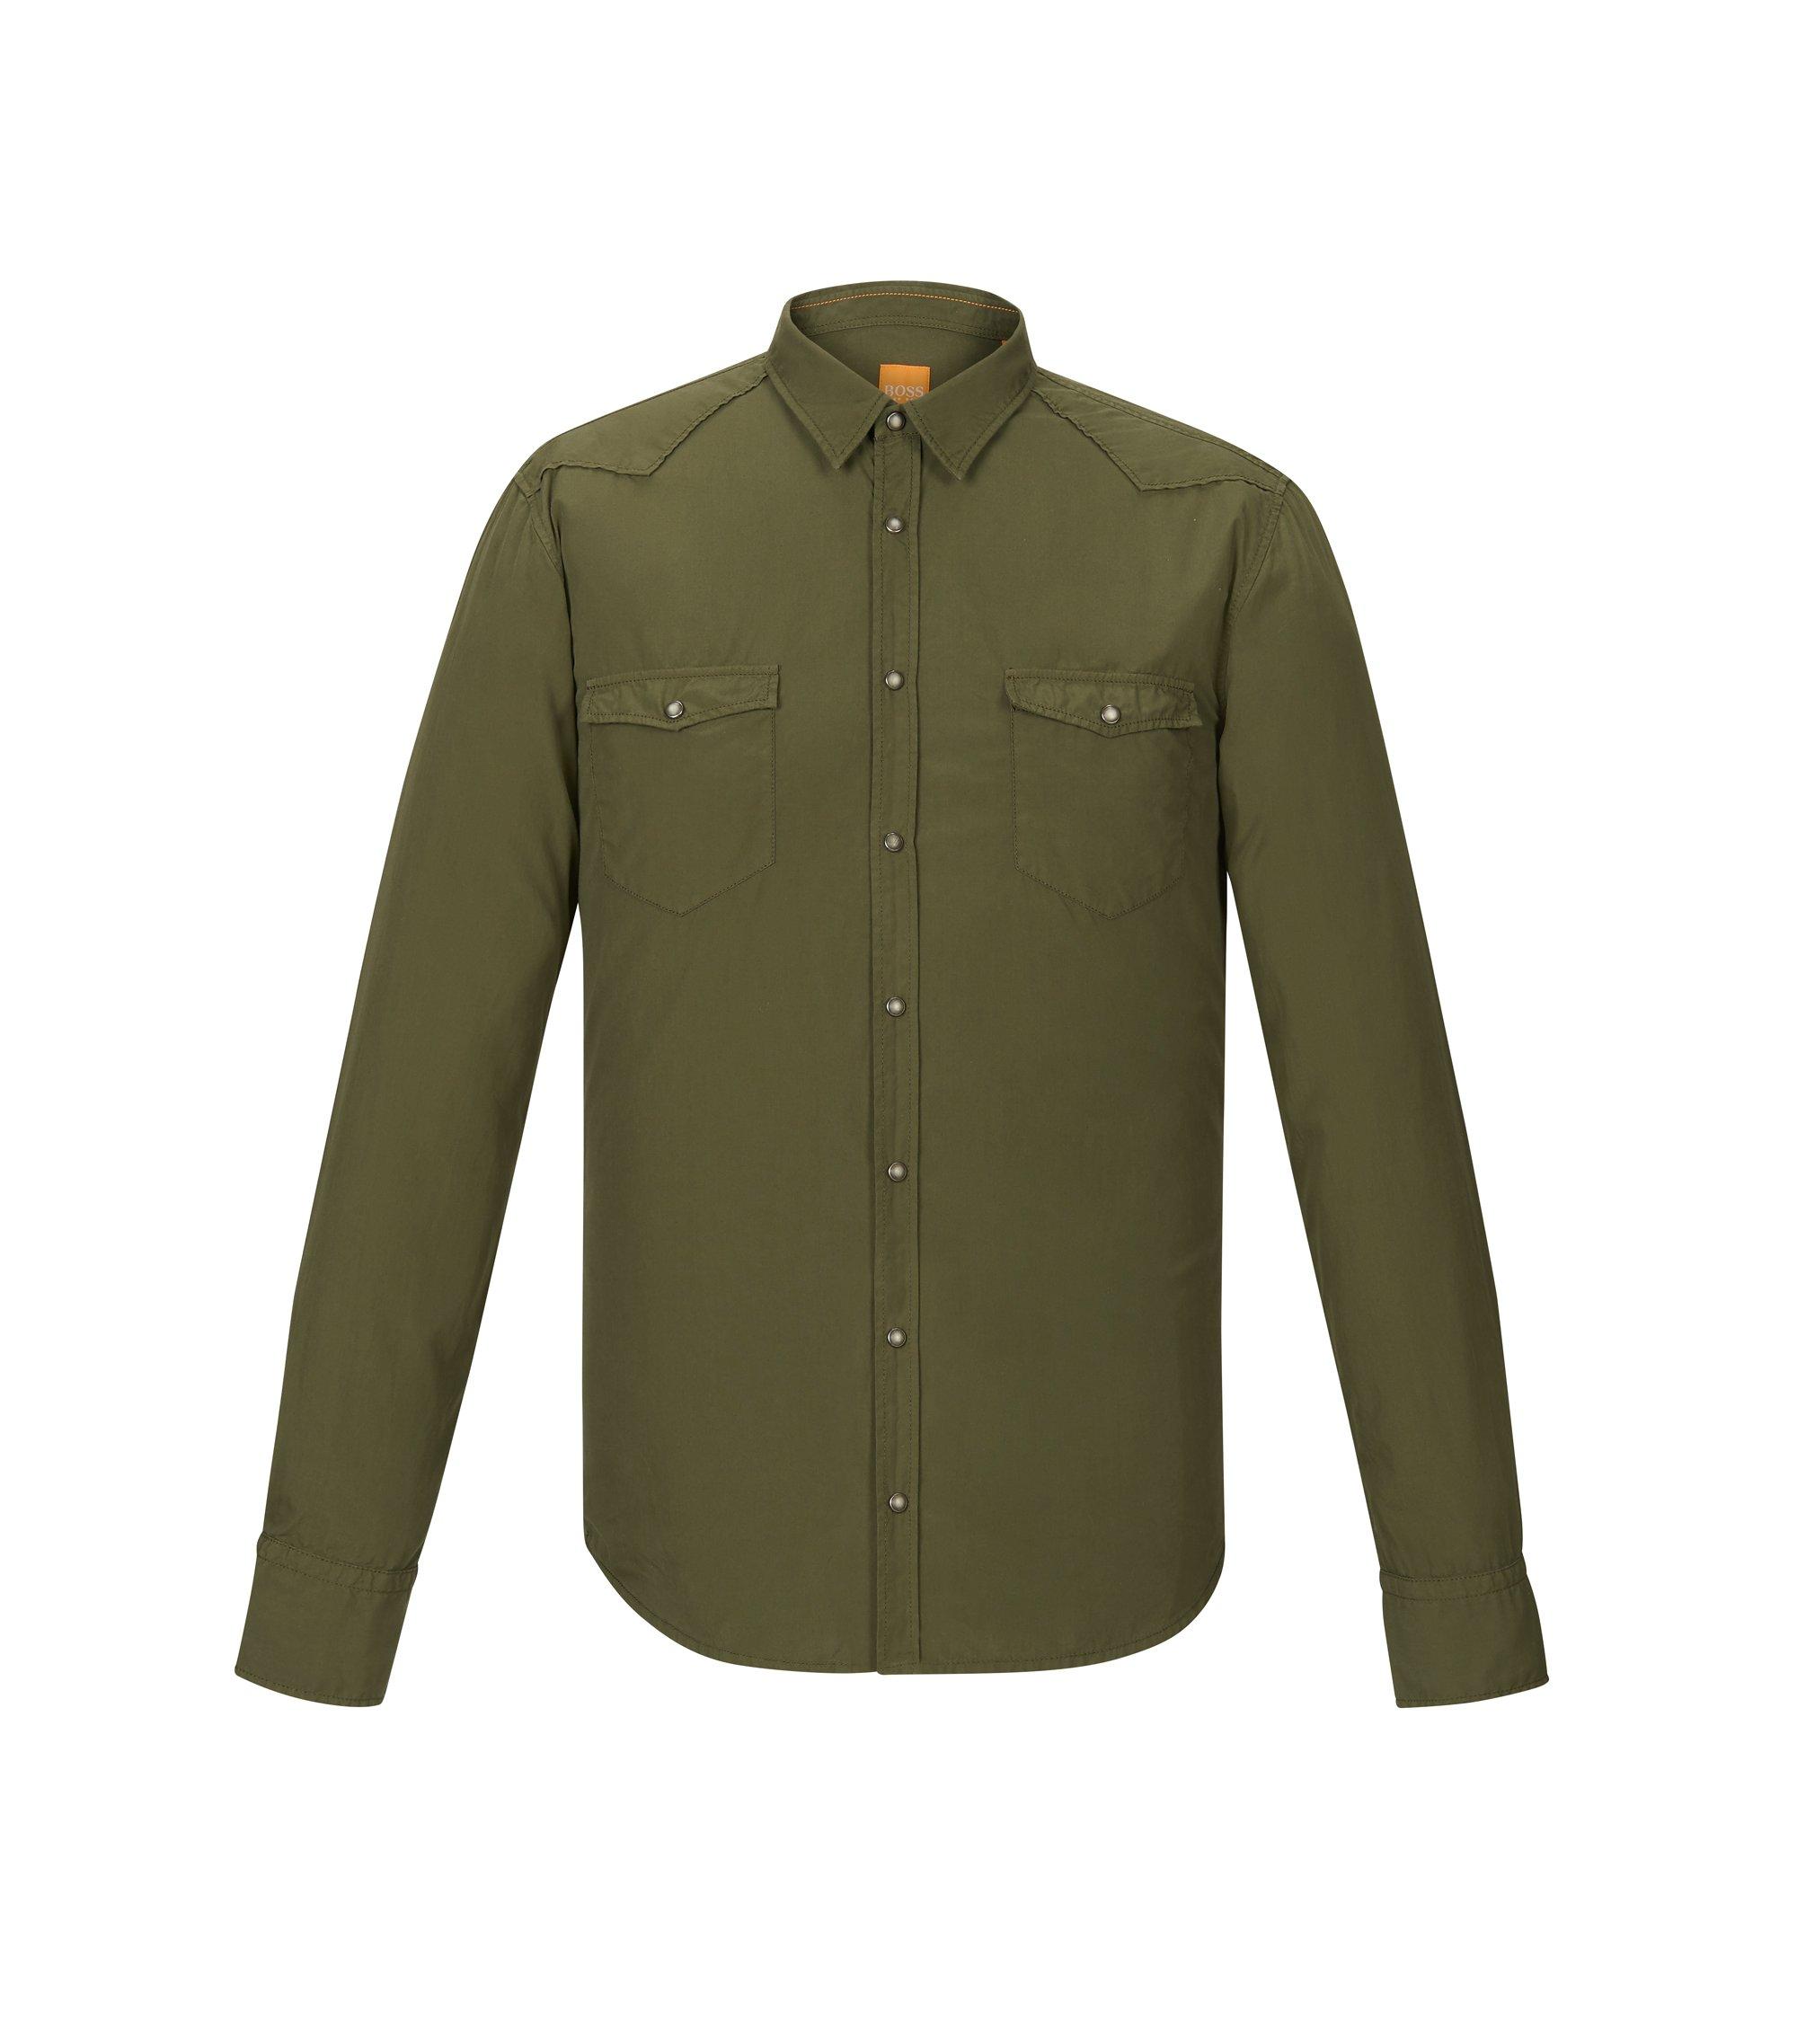 Cotton Poplin Button Down Shirt, Slim Fit | Erodeo Short, Dark Green